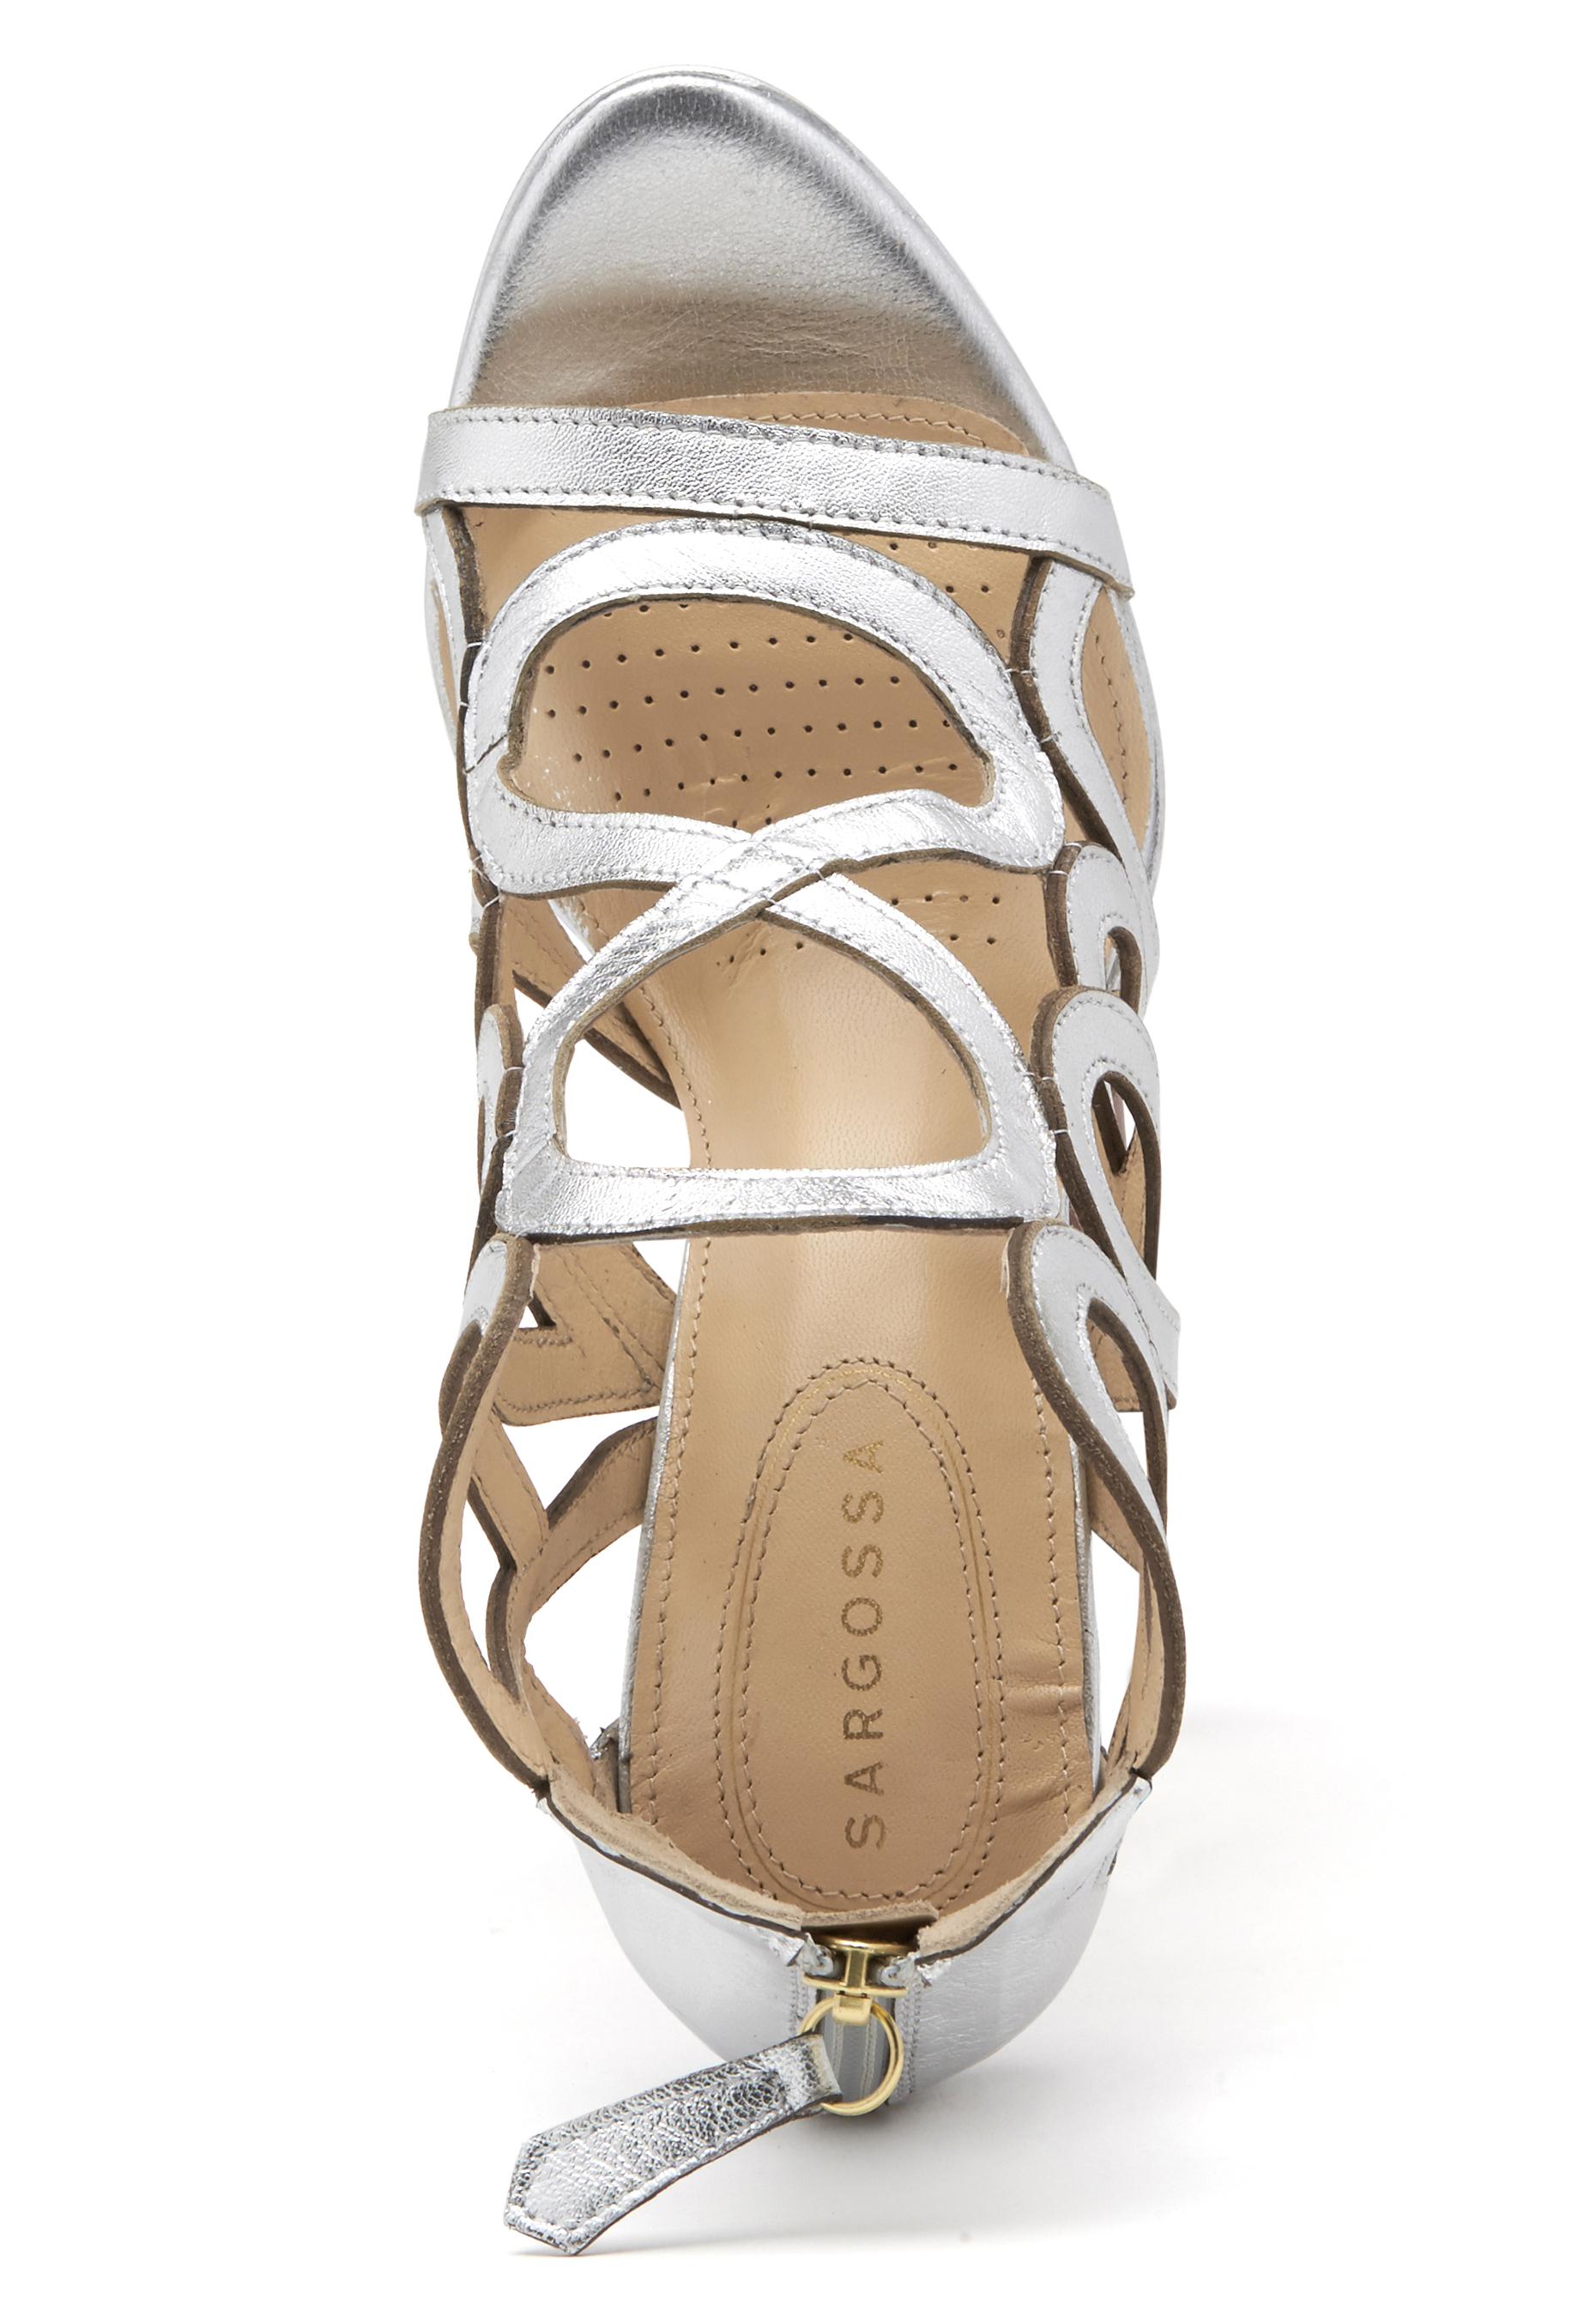 30e64d09c122 SARGOSSA Redefined Leather Heels Silver - Bubbleroom